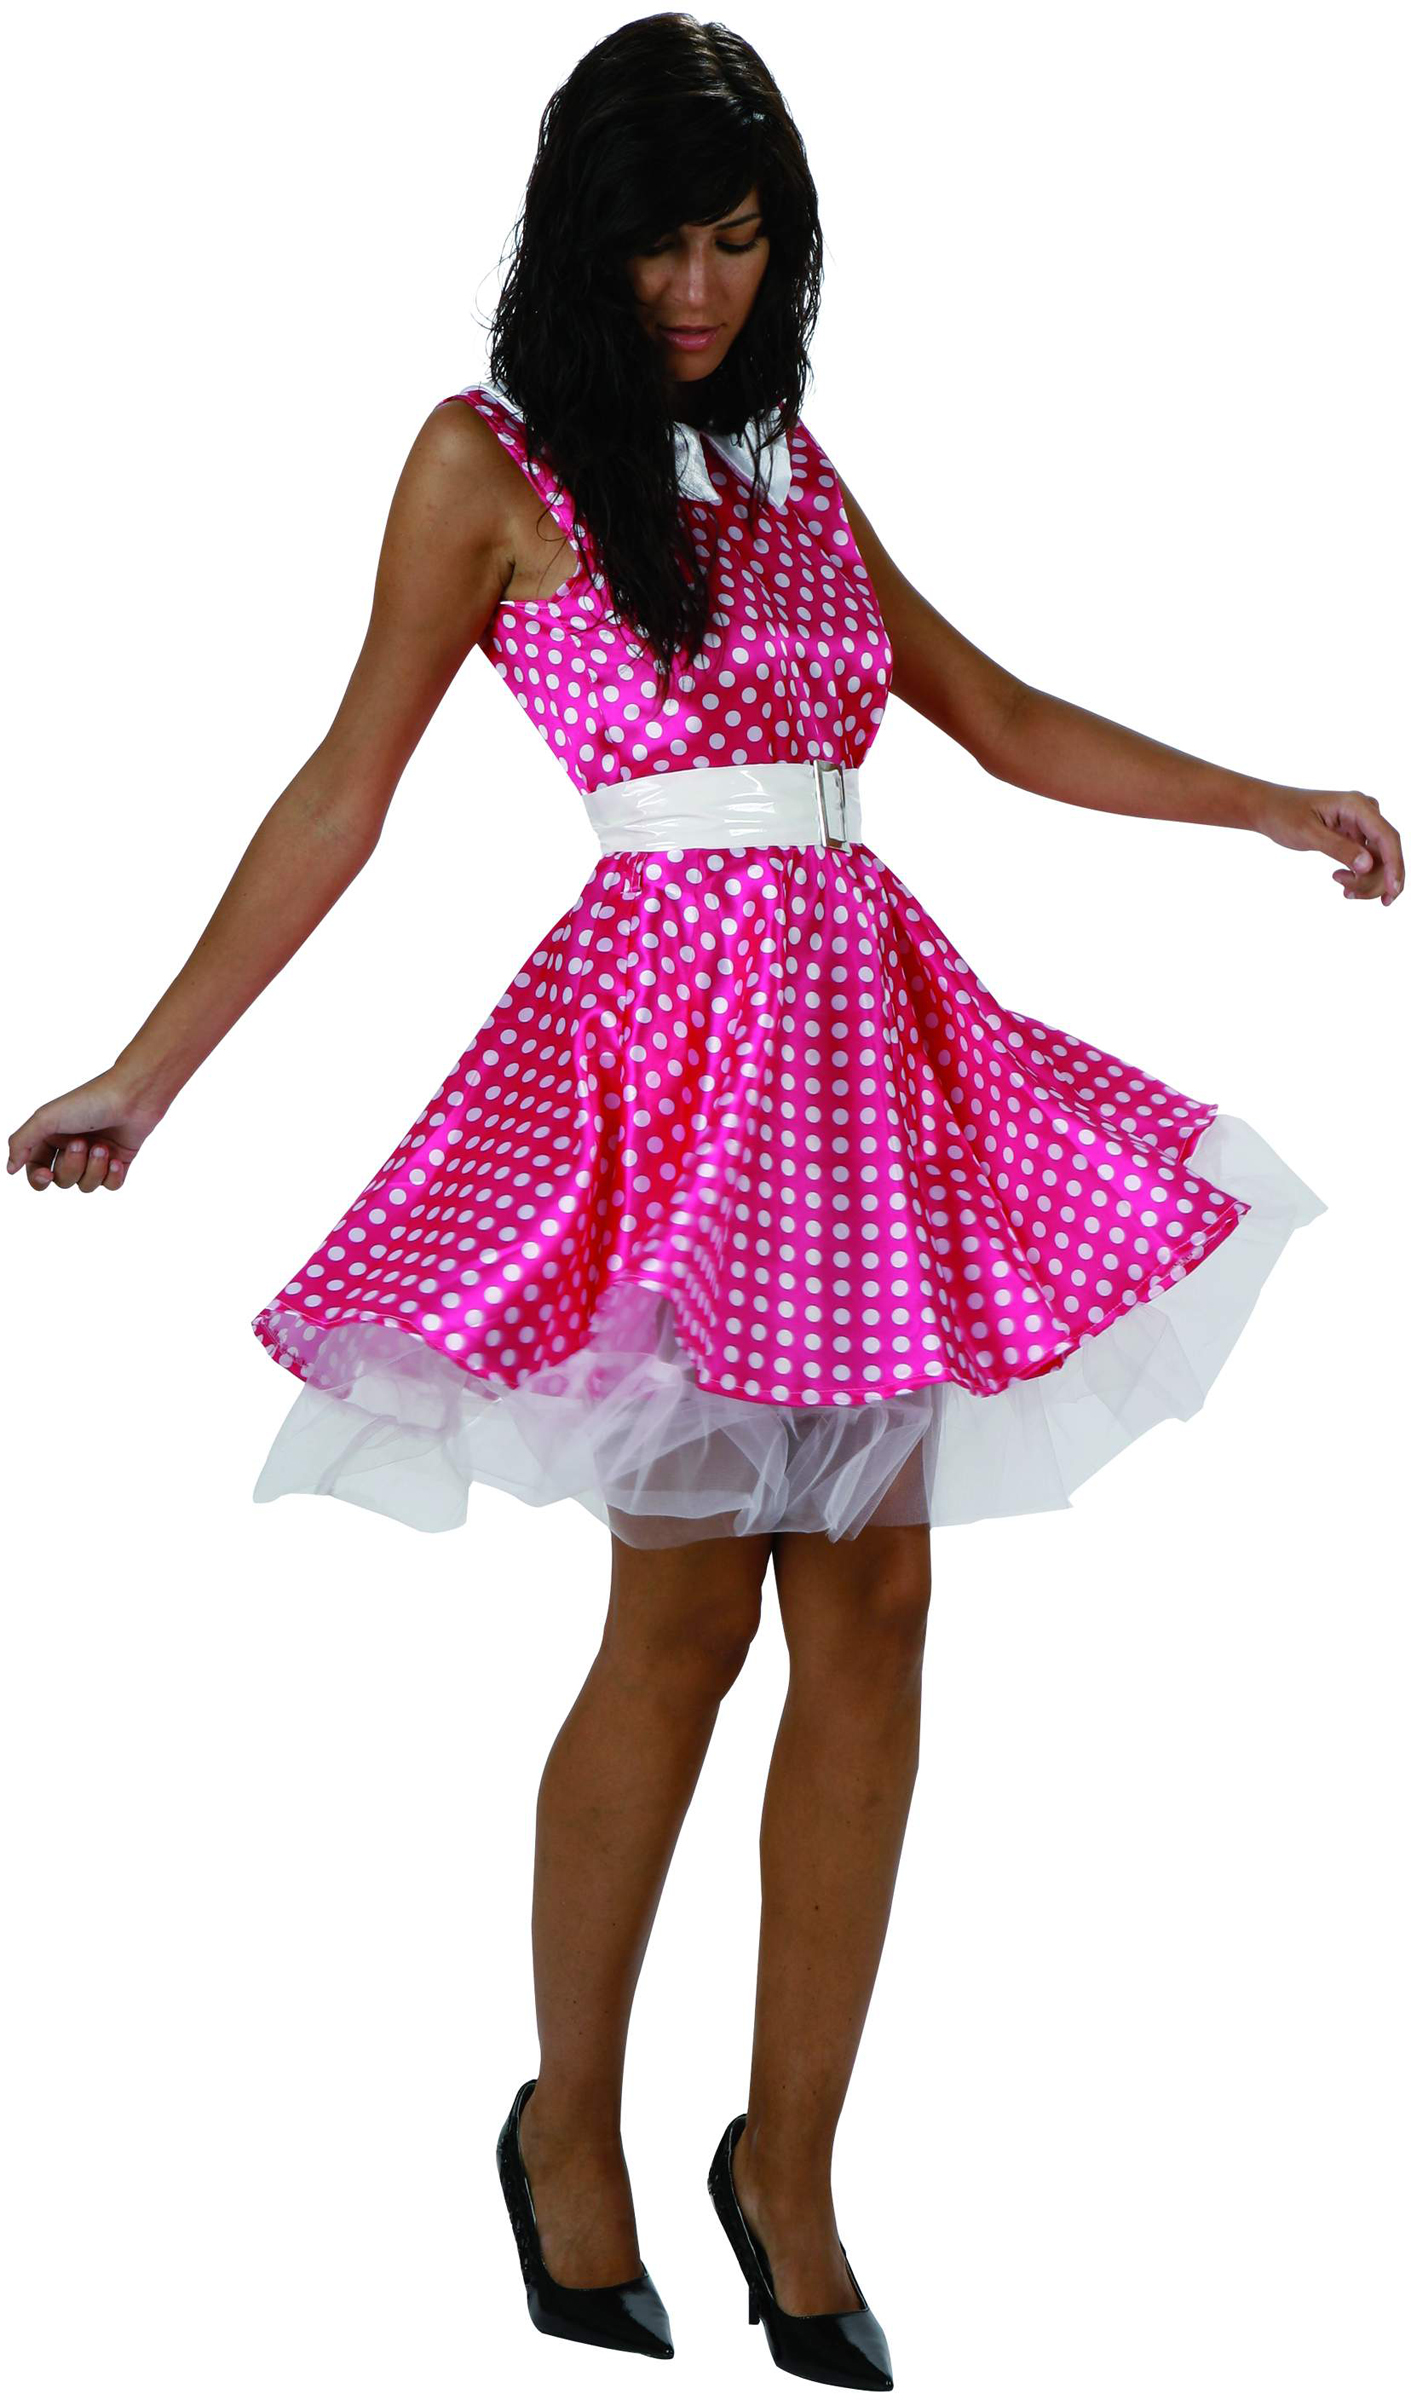 robe chic robe années 50 robe rock jaune robe a pois rose